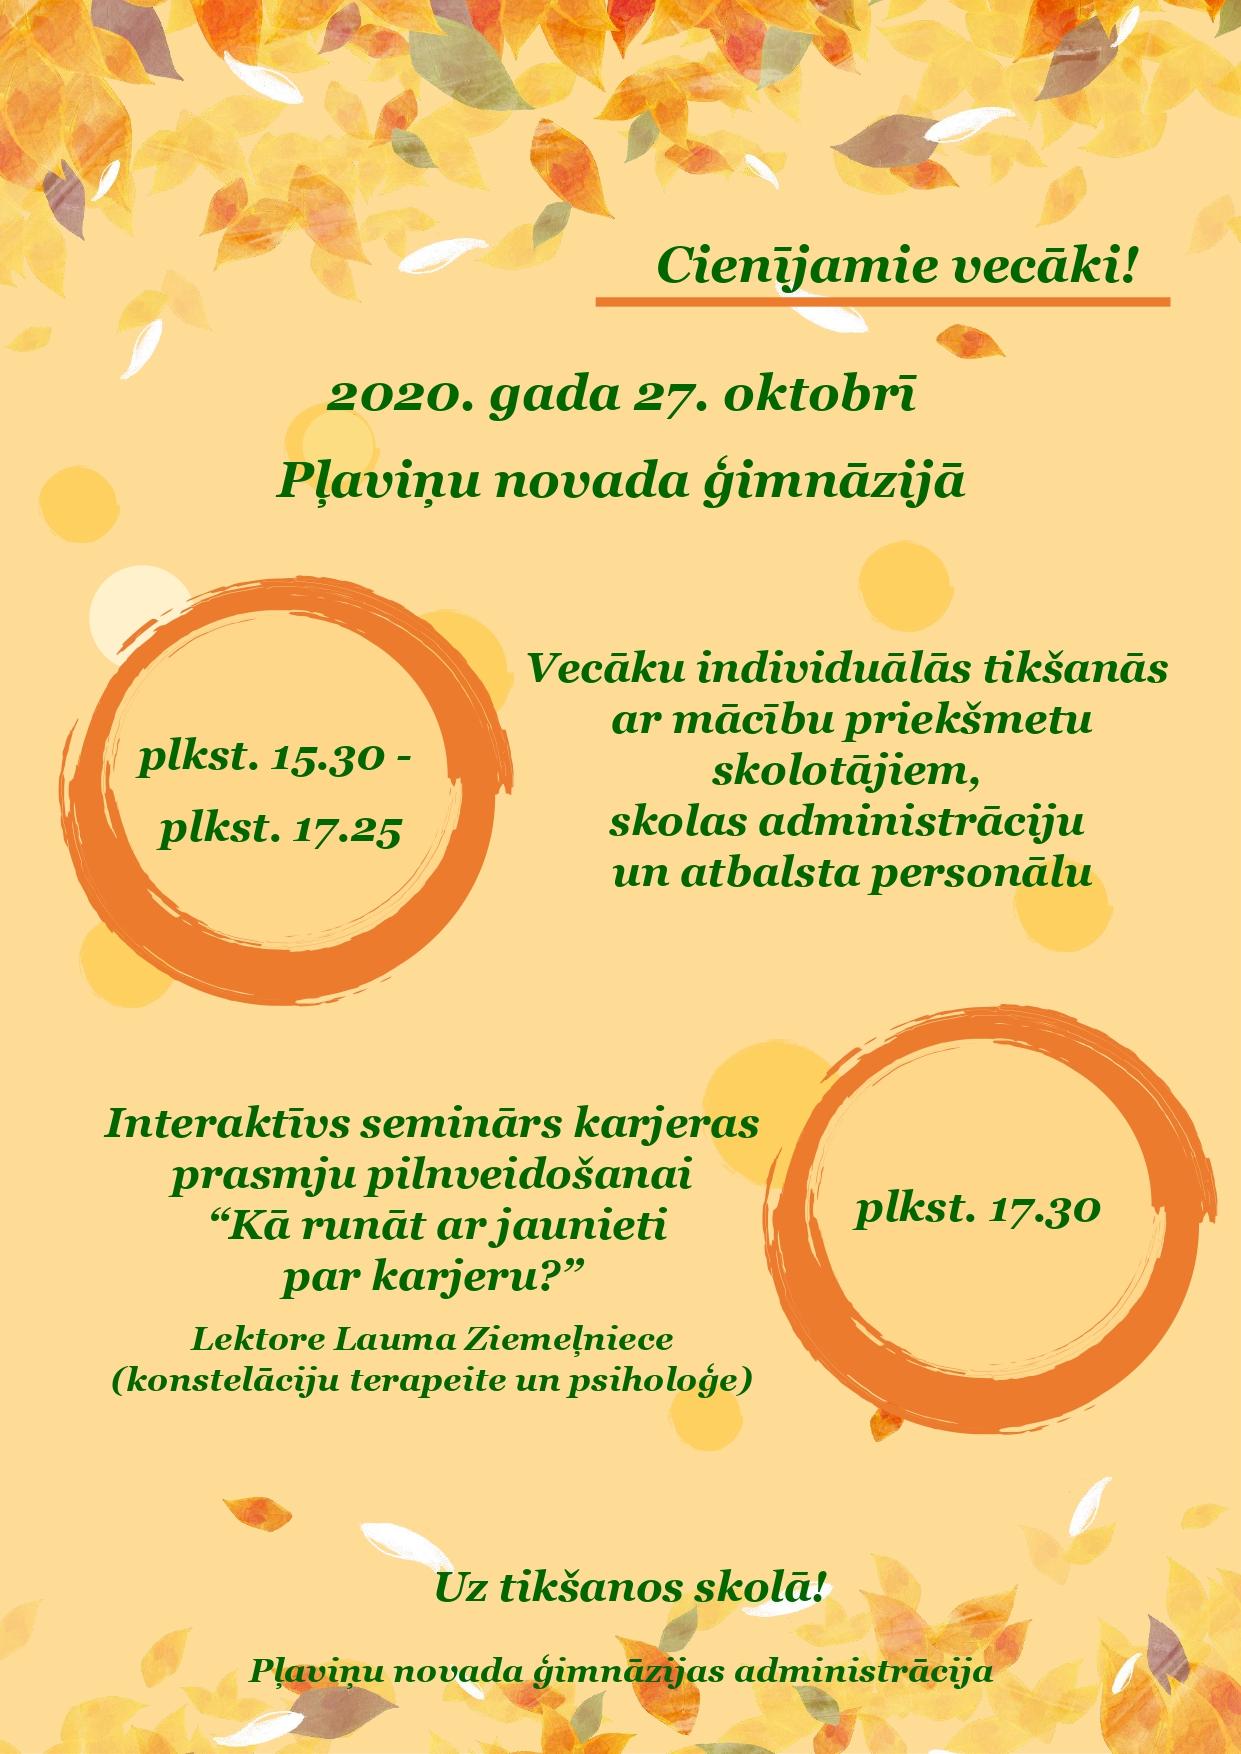 afisa_vecaku_indiv_tiksanas_skola